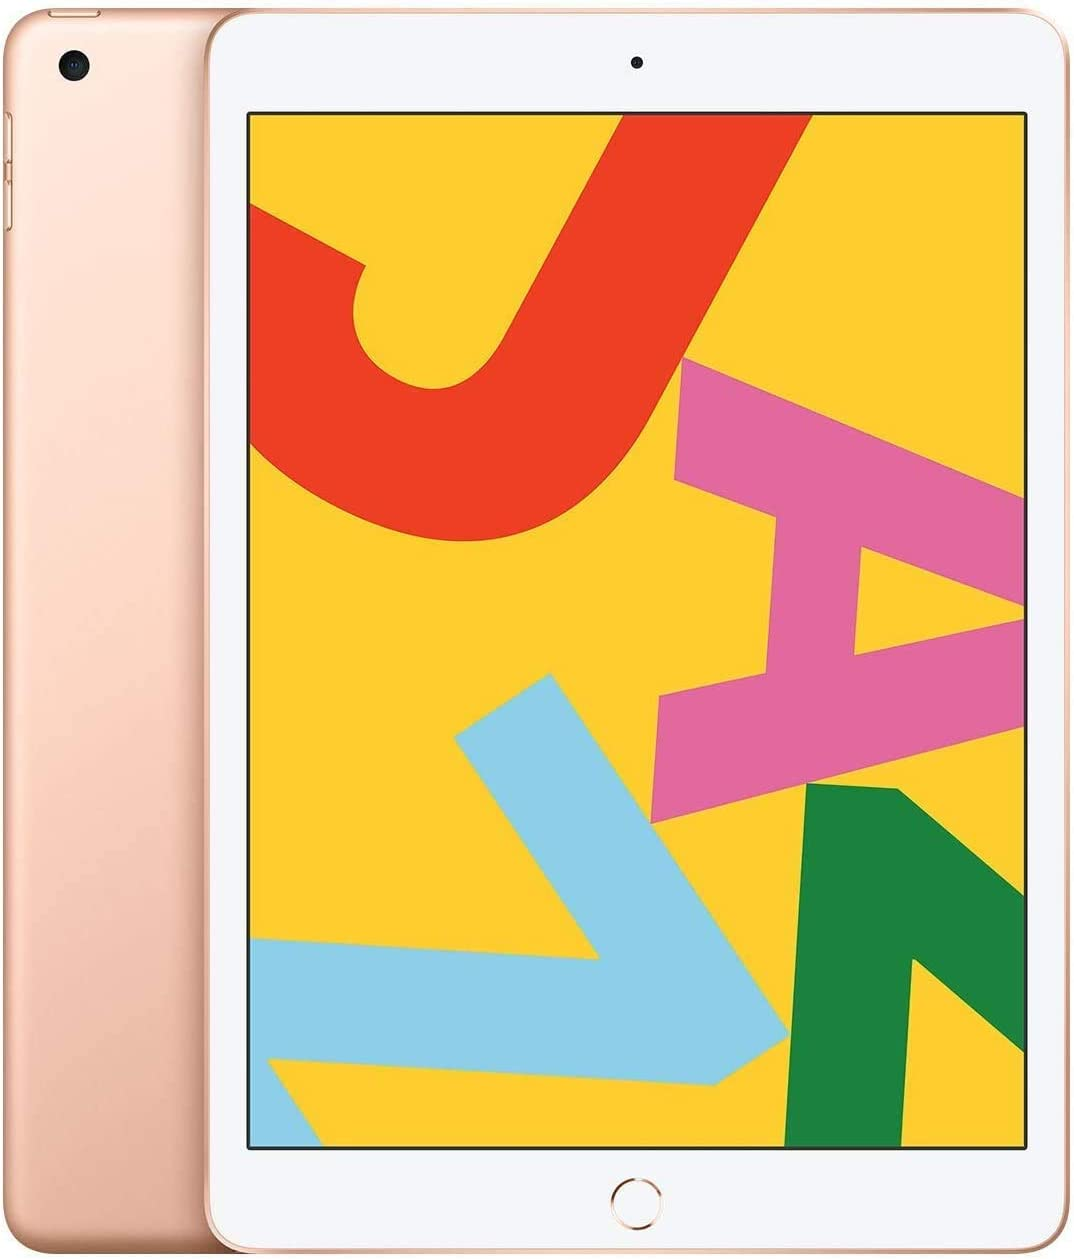 New Apple iPad (10.2-Inch, Wi-Fi + Cellular, 128GB) - Gold (Latest Model) (Renewed)